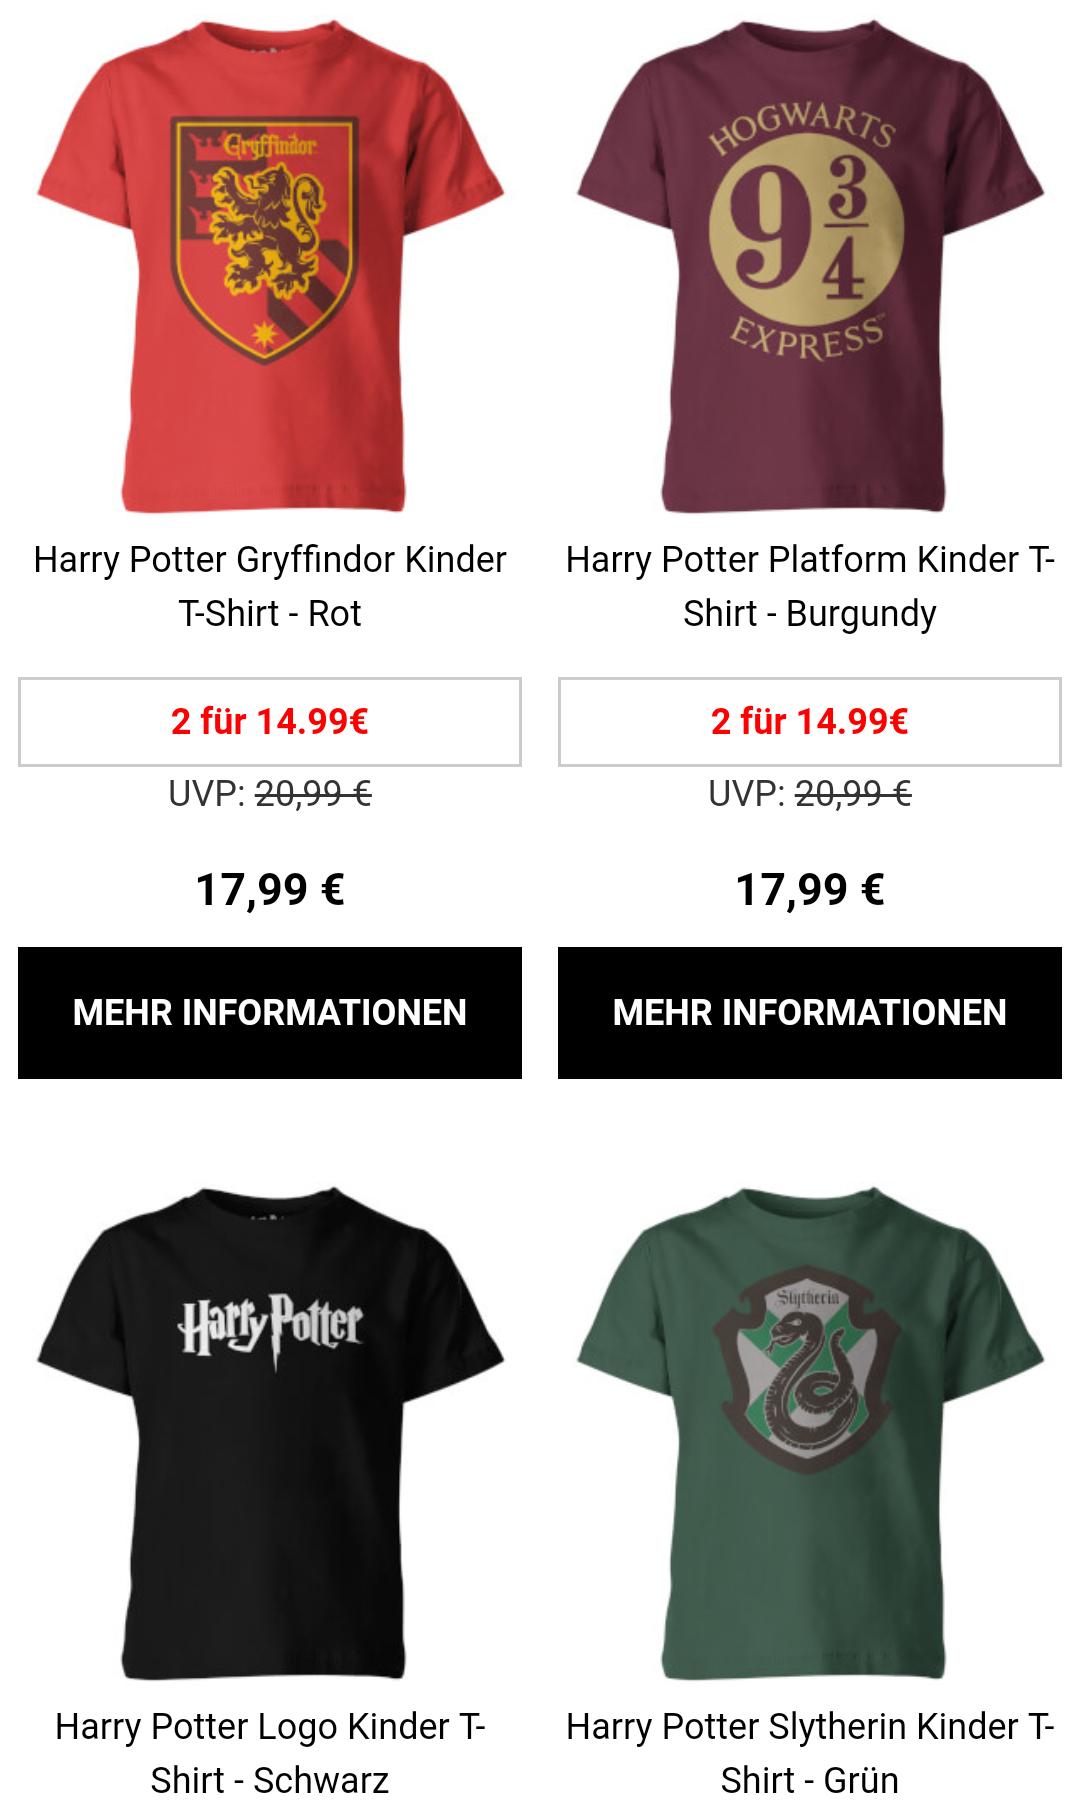 Harry Potter Kinder Shirts 2 für 1.